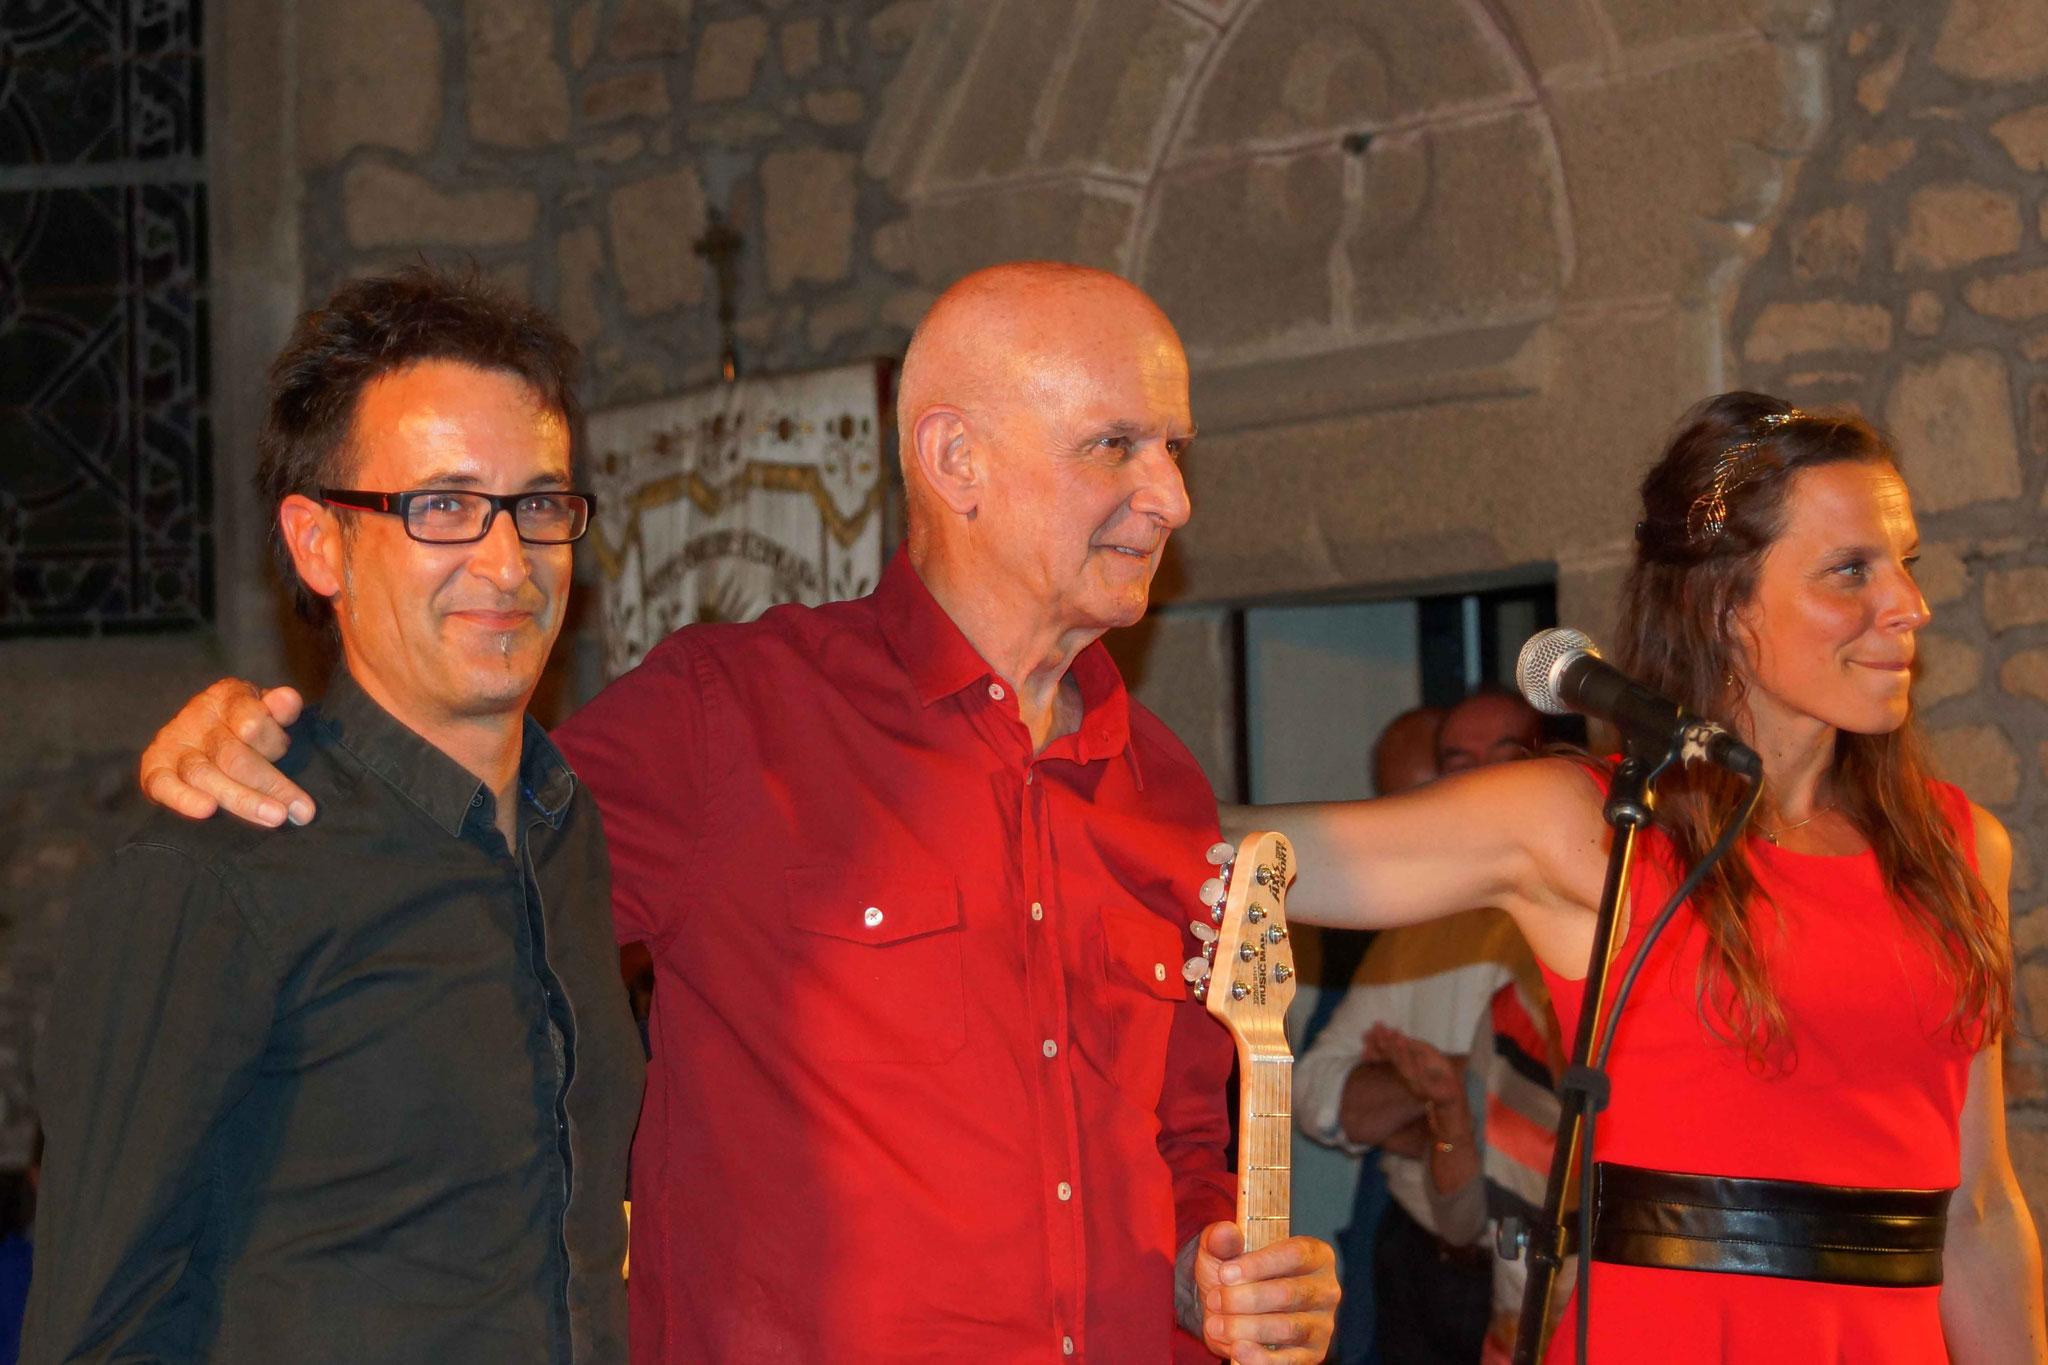 Concert de Kermaria Sulard, 28 août 2016 ; 6